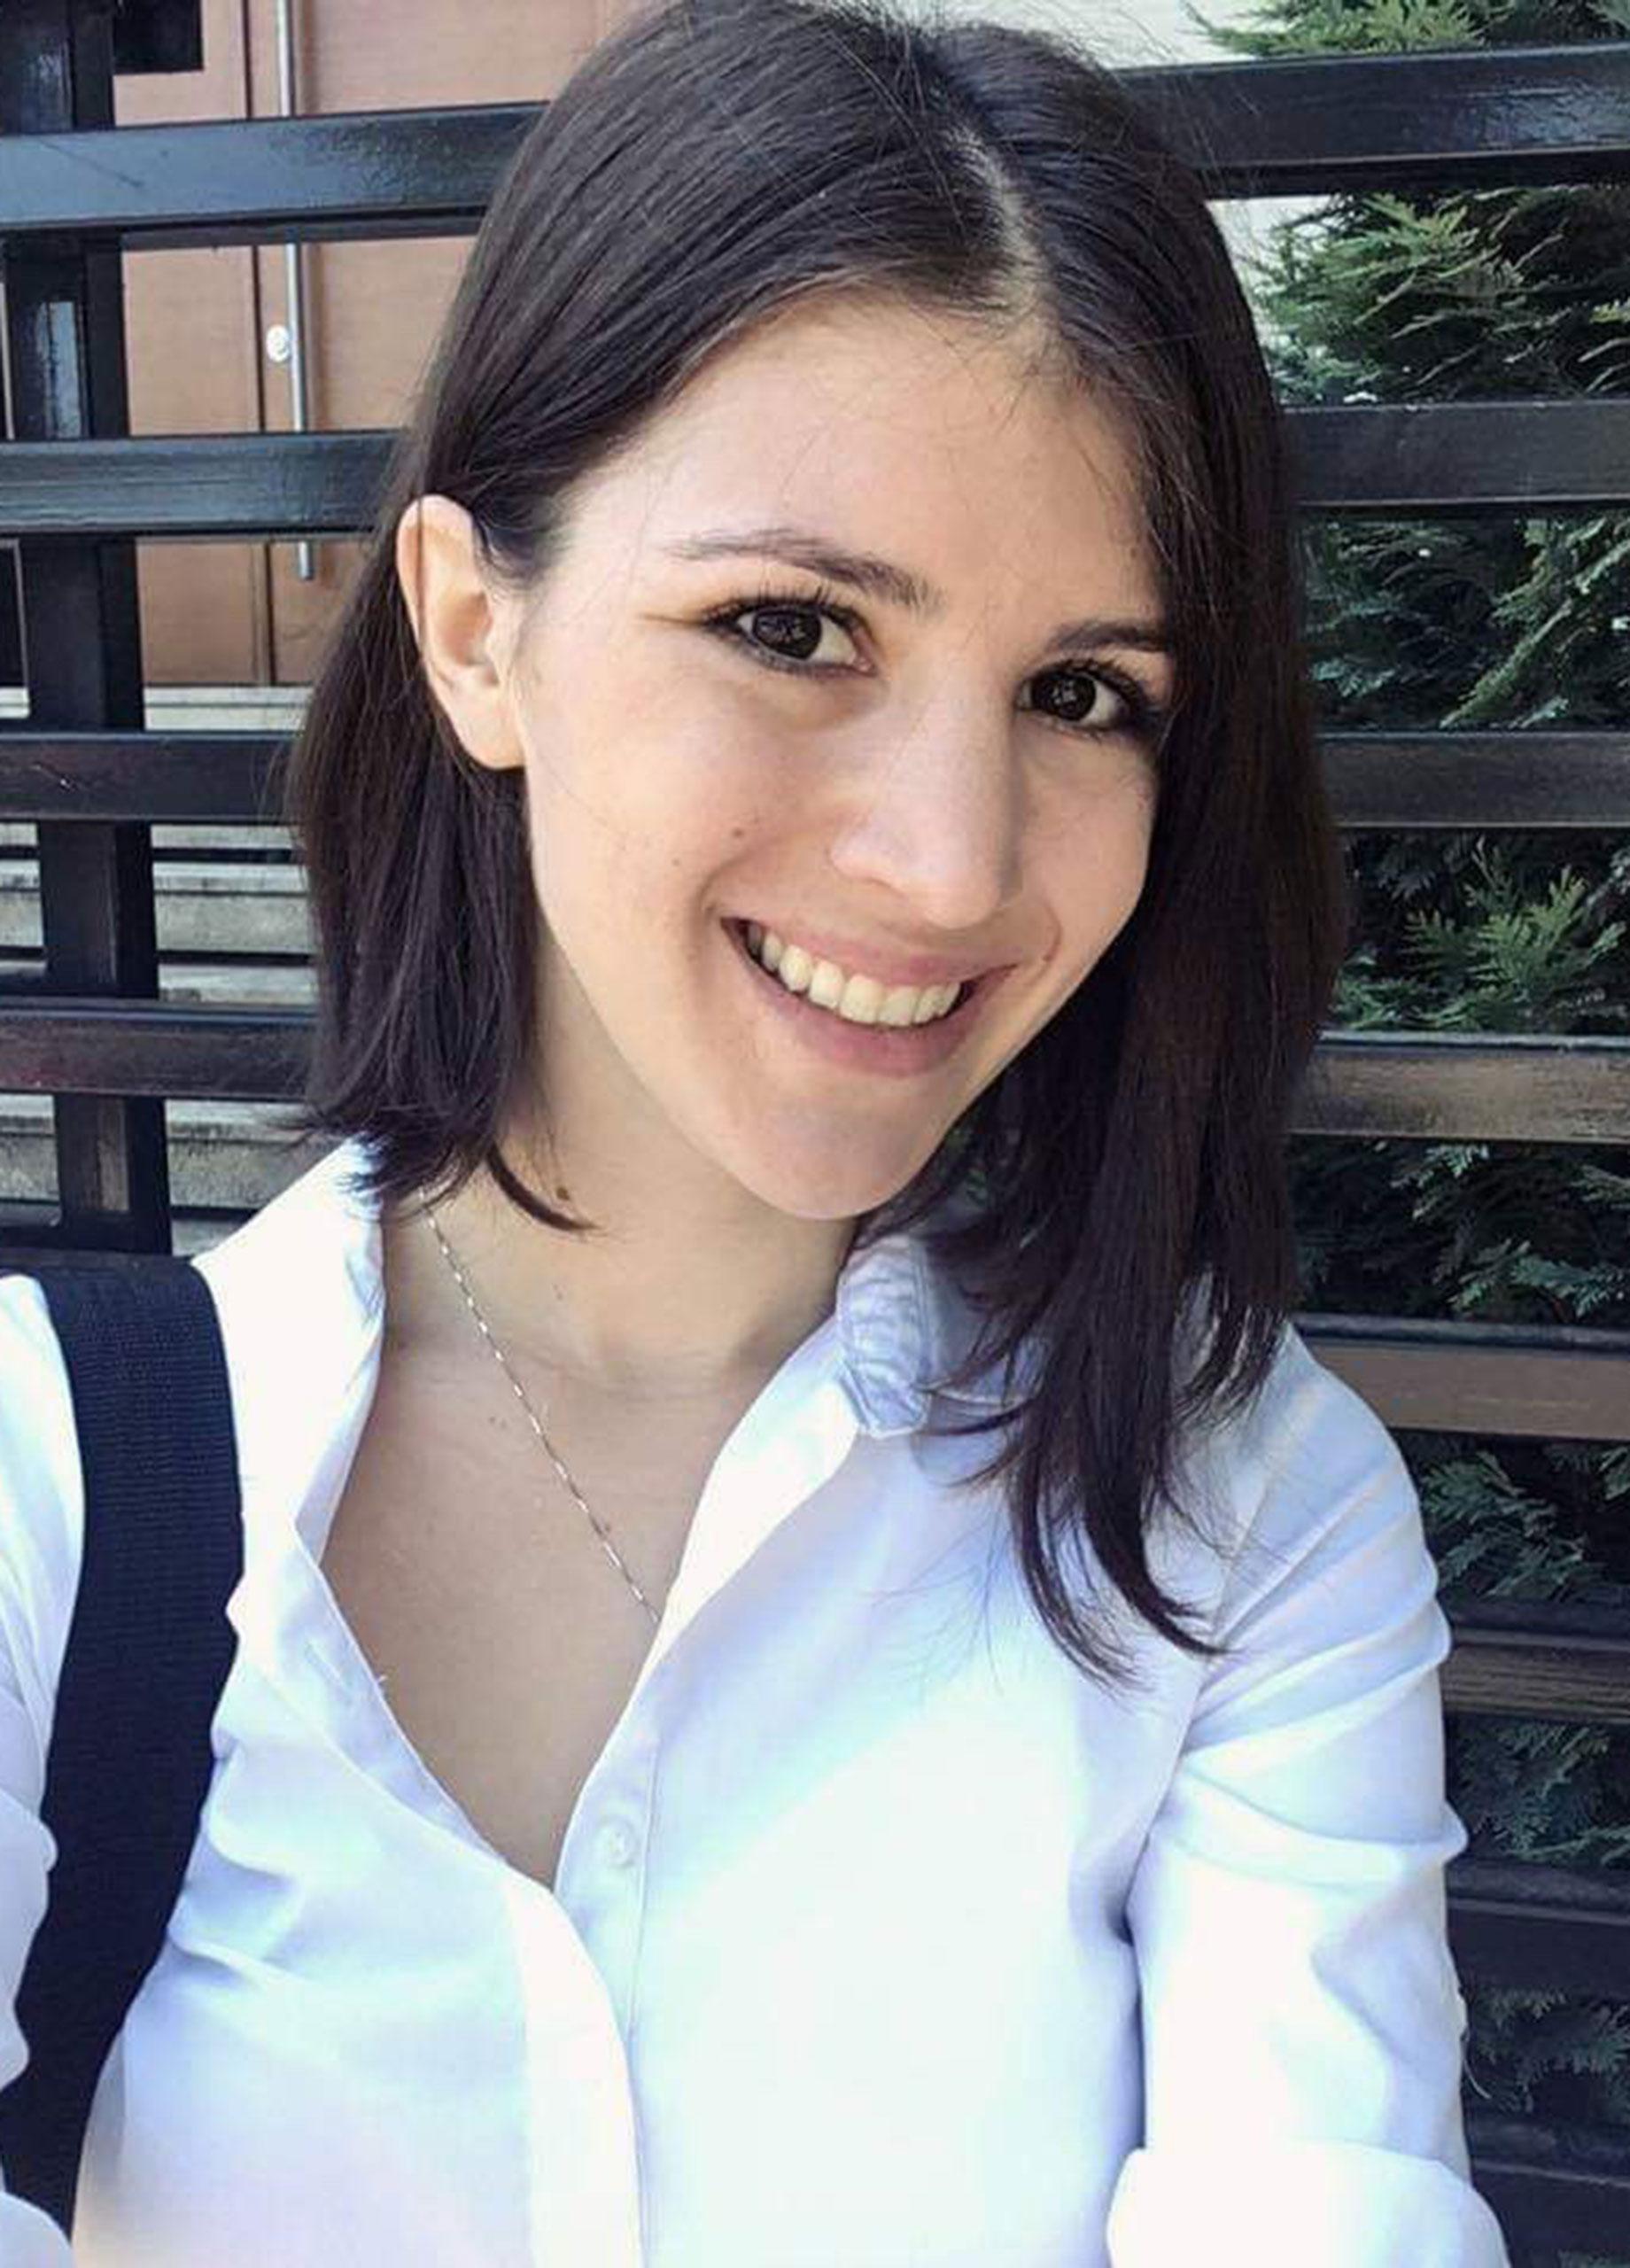 Jelena Mircetic